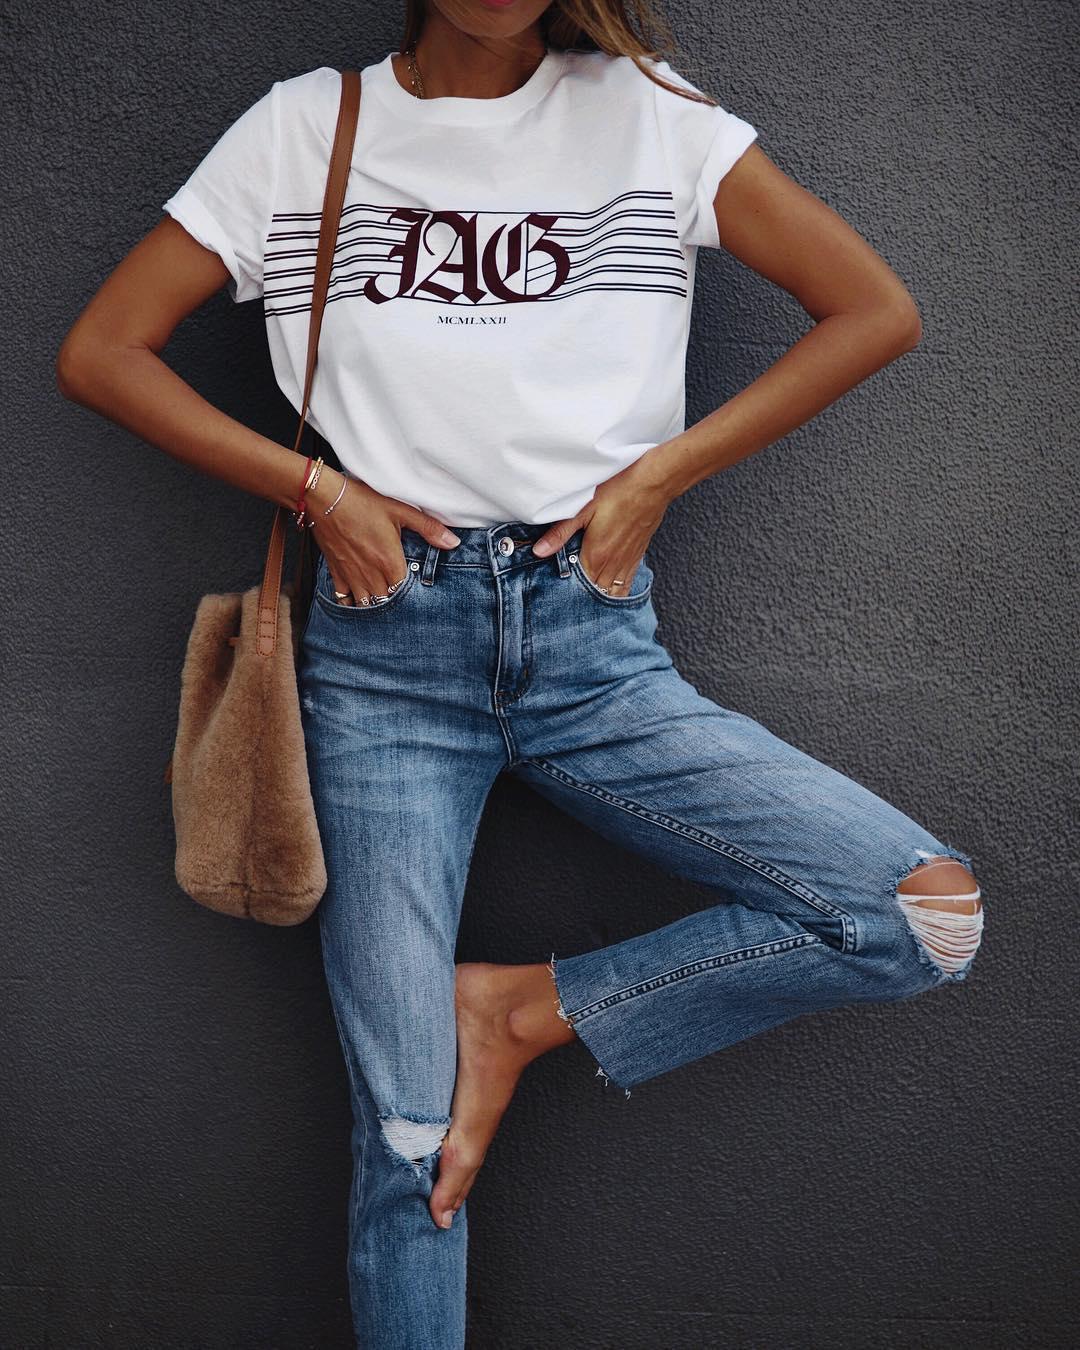 джинсы и футболка фото 12